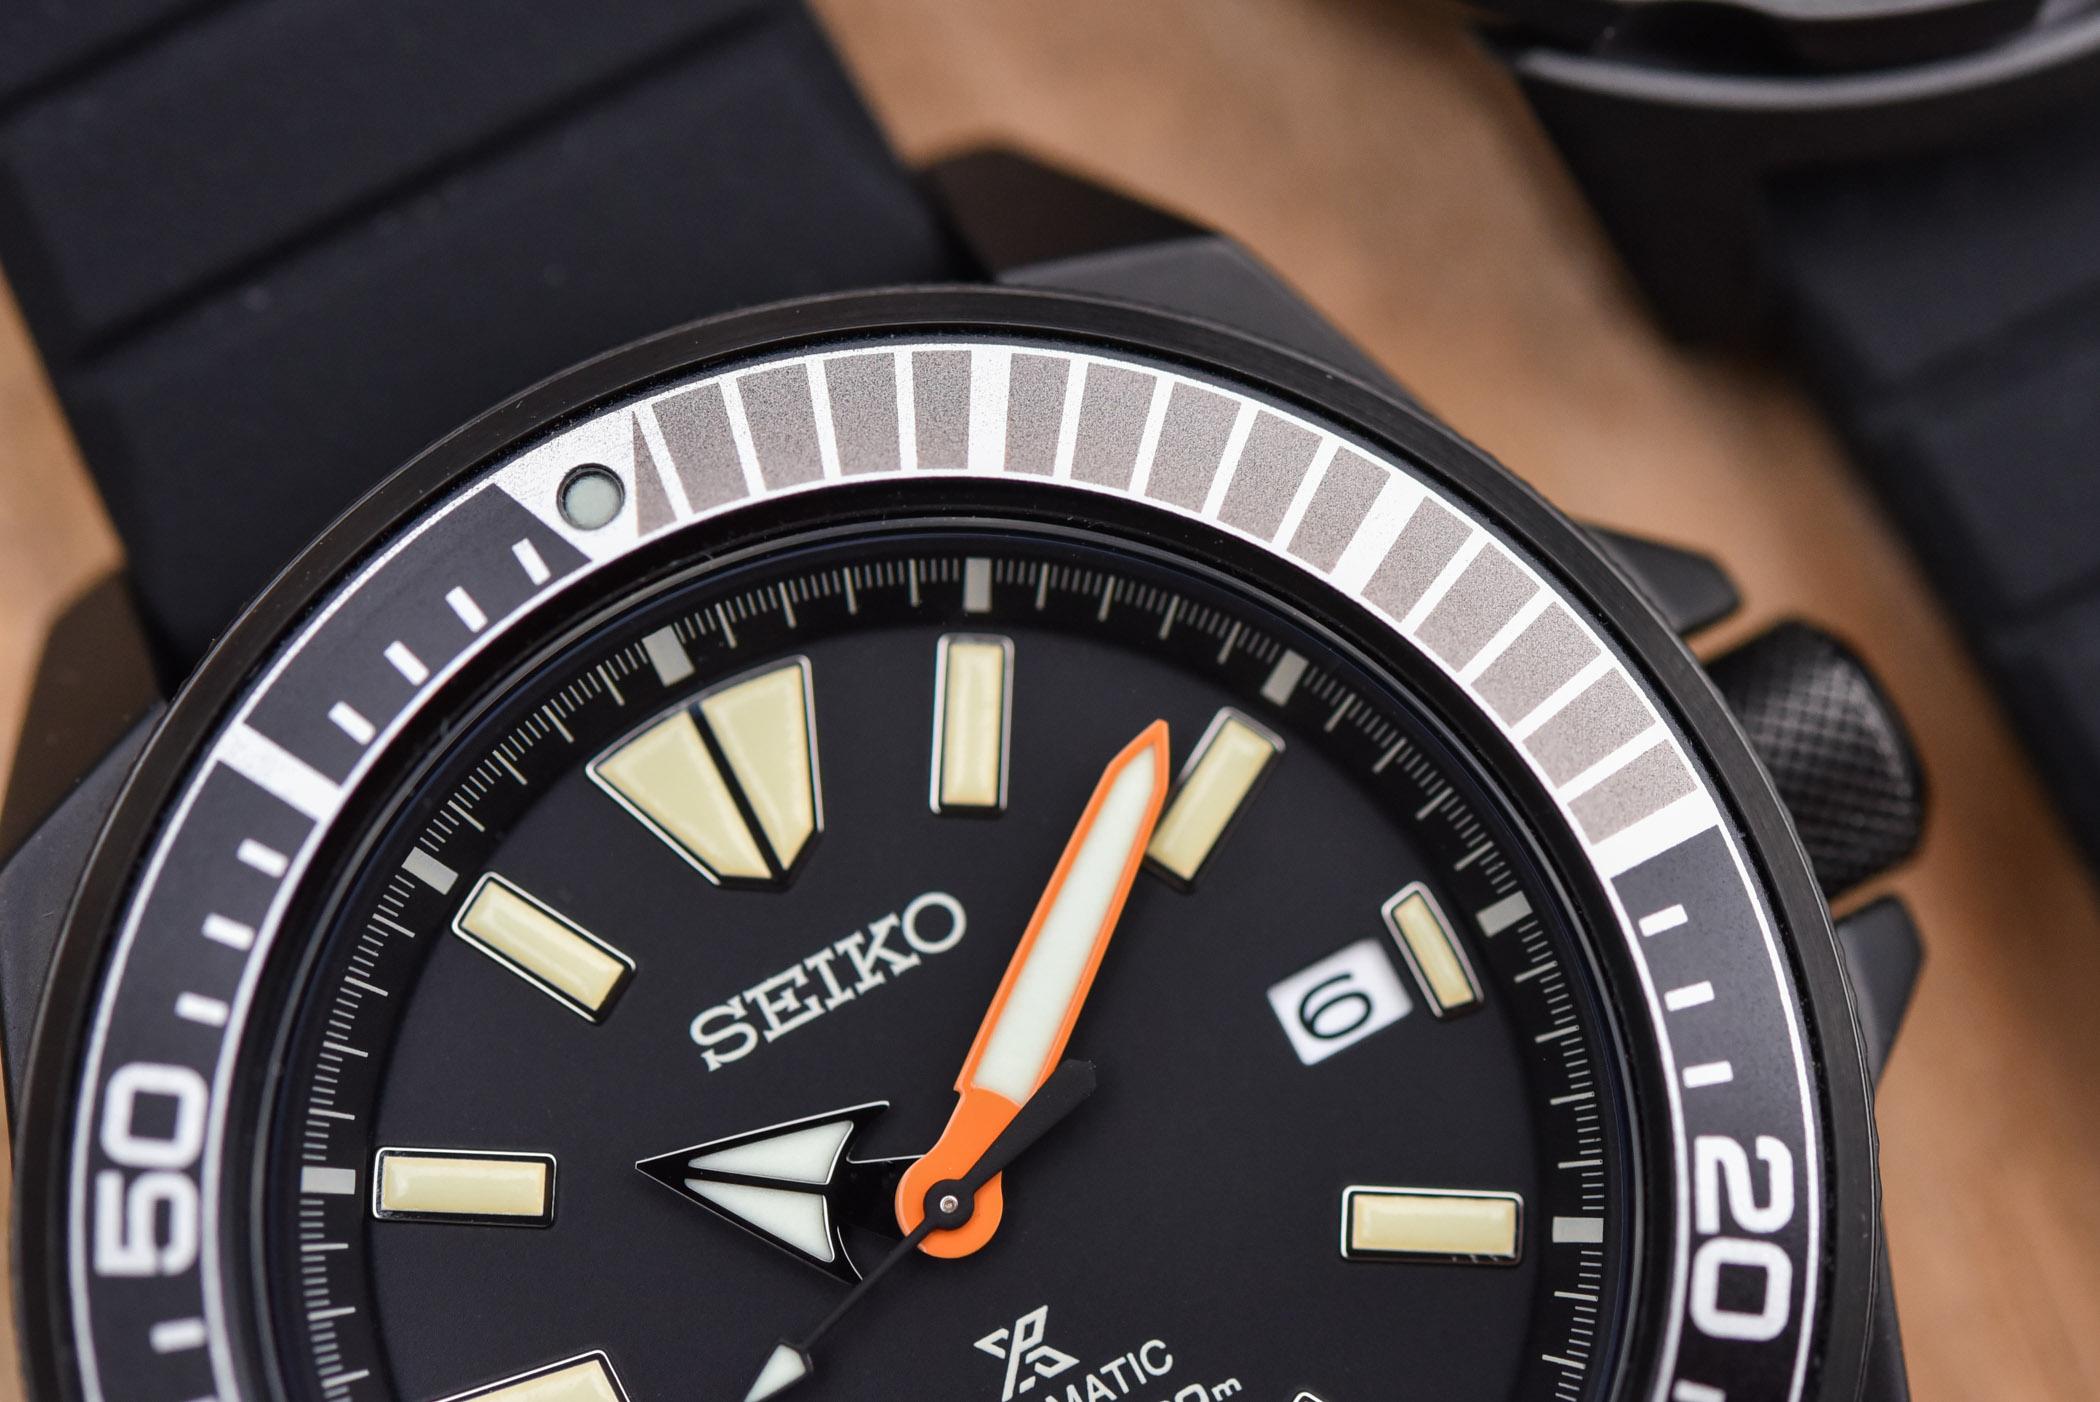 Seiko-Prospex-Black-Series-2021-Samurai-SRPH11K1-3.jpg